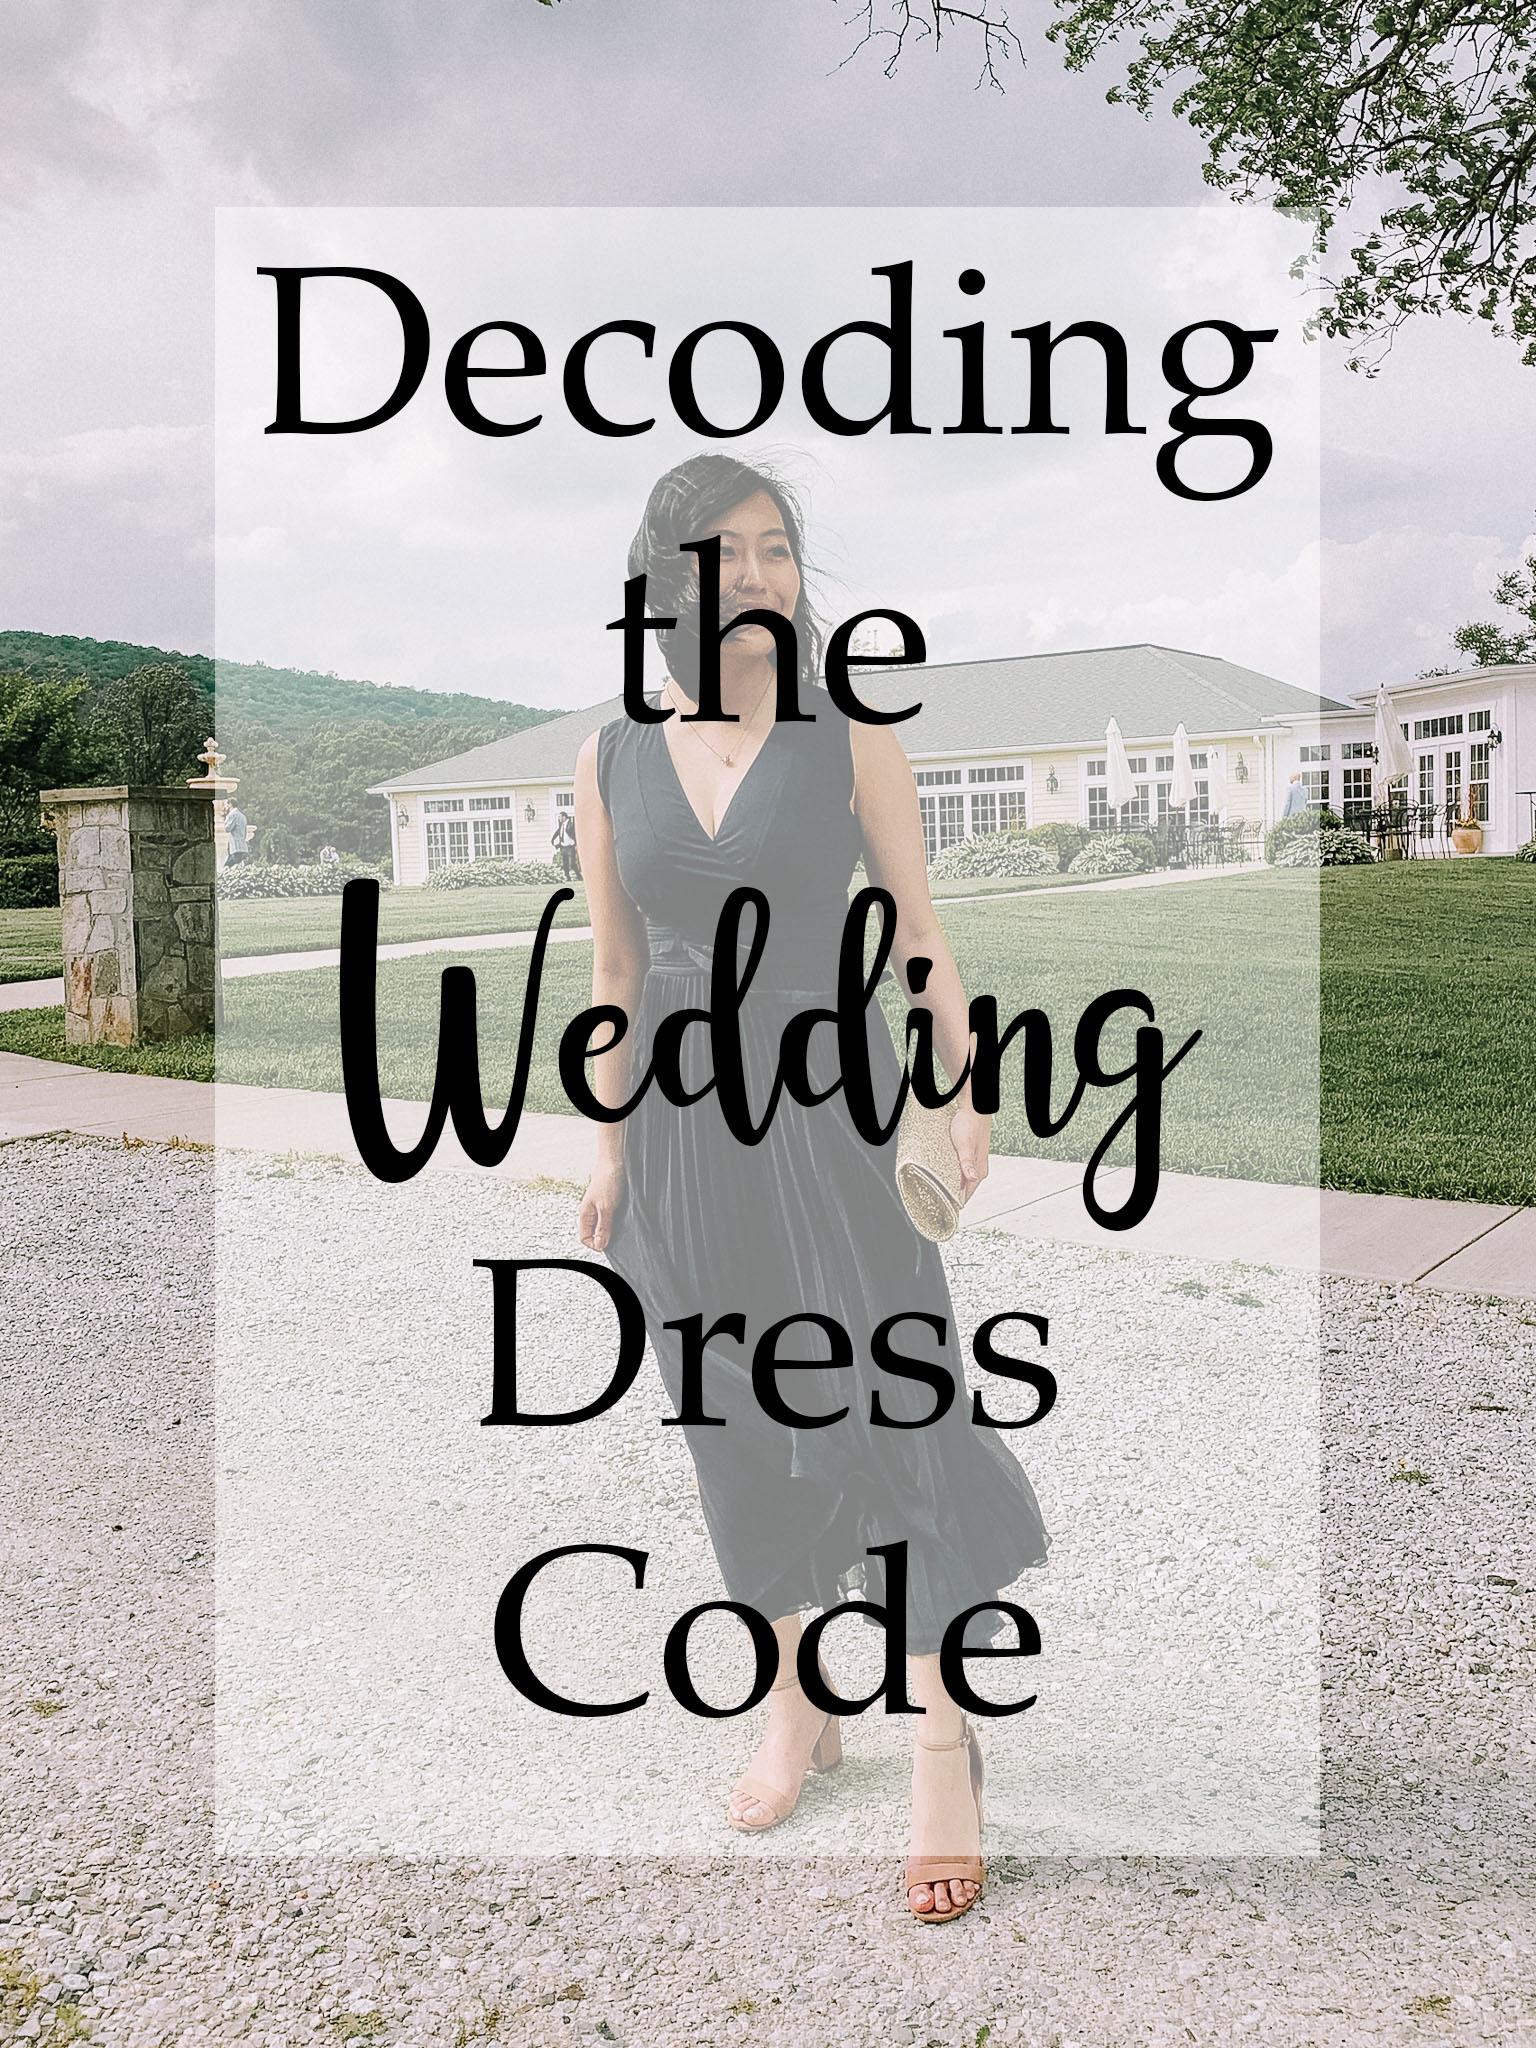 Decoding the Wedding Dress Code